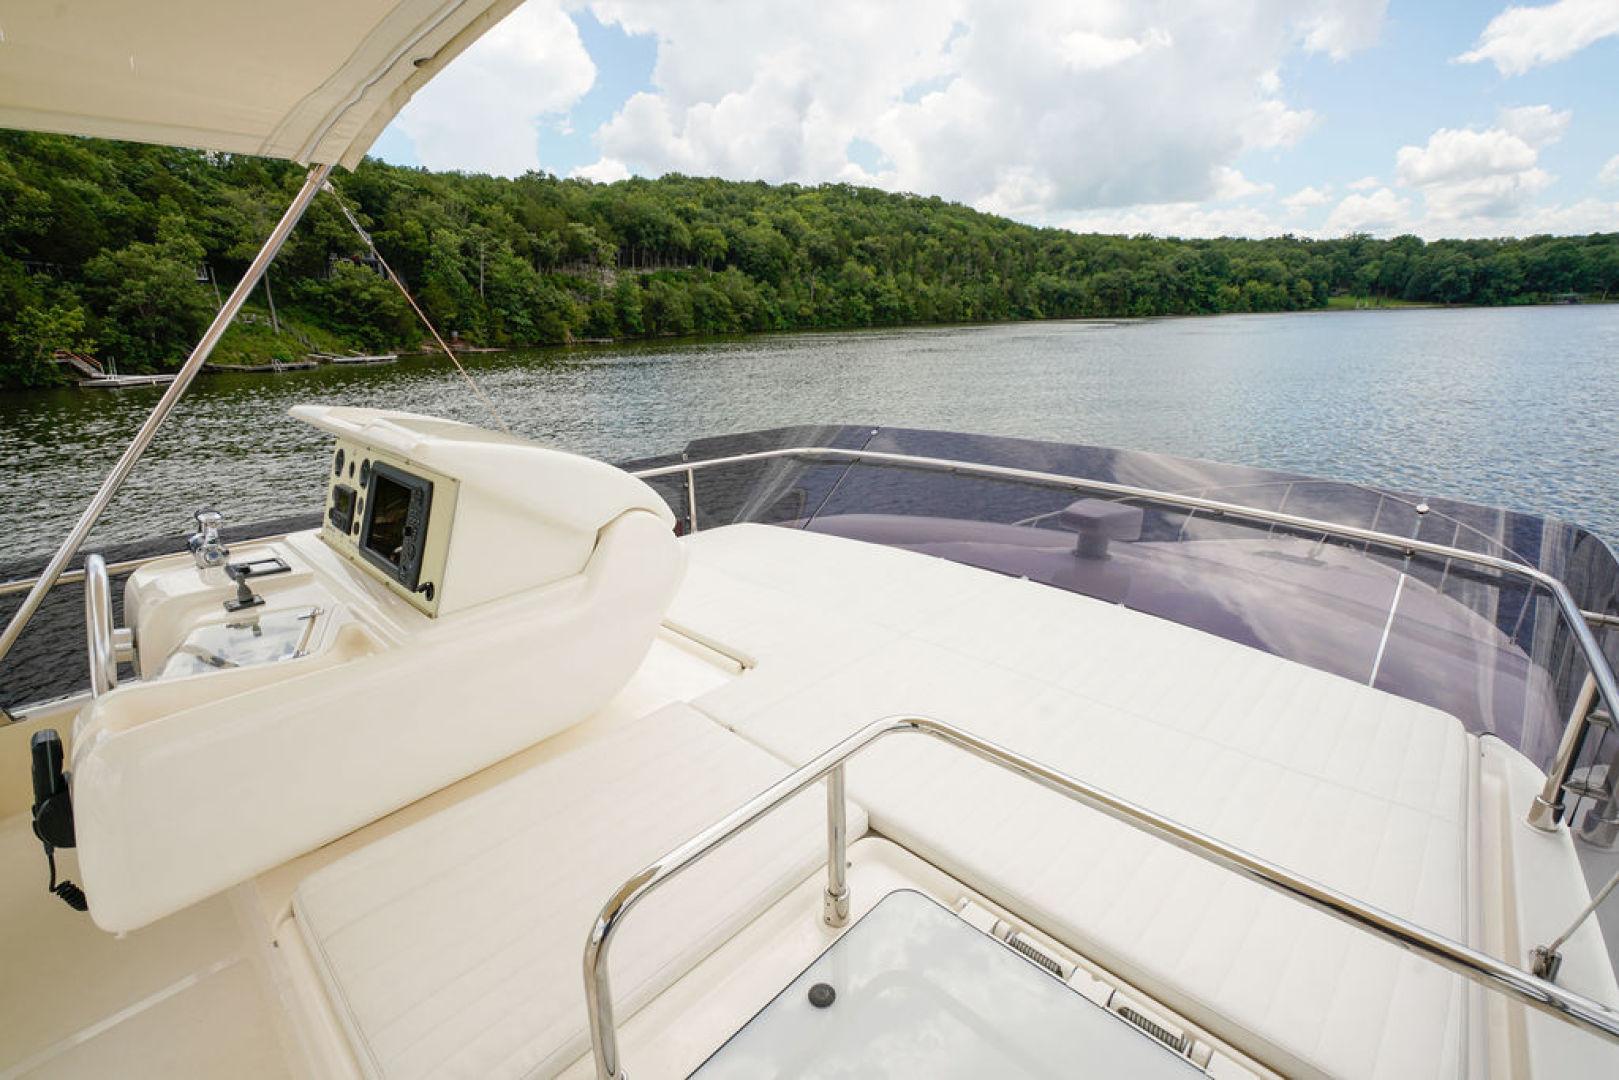 Ferretti Yachts-530 2013-ISLAND GIRL Mount Juliet-Tennessee-United States-1574685   Thumbnail